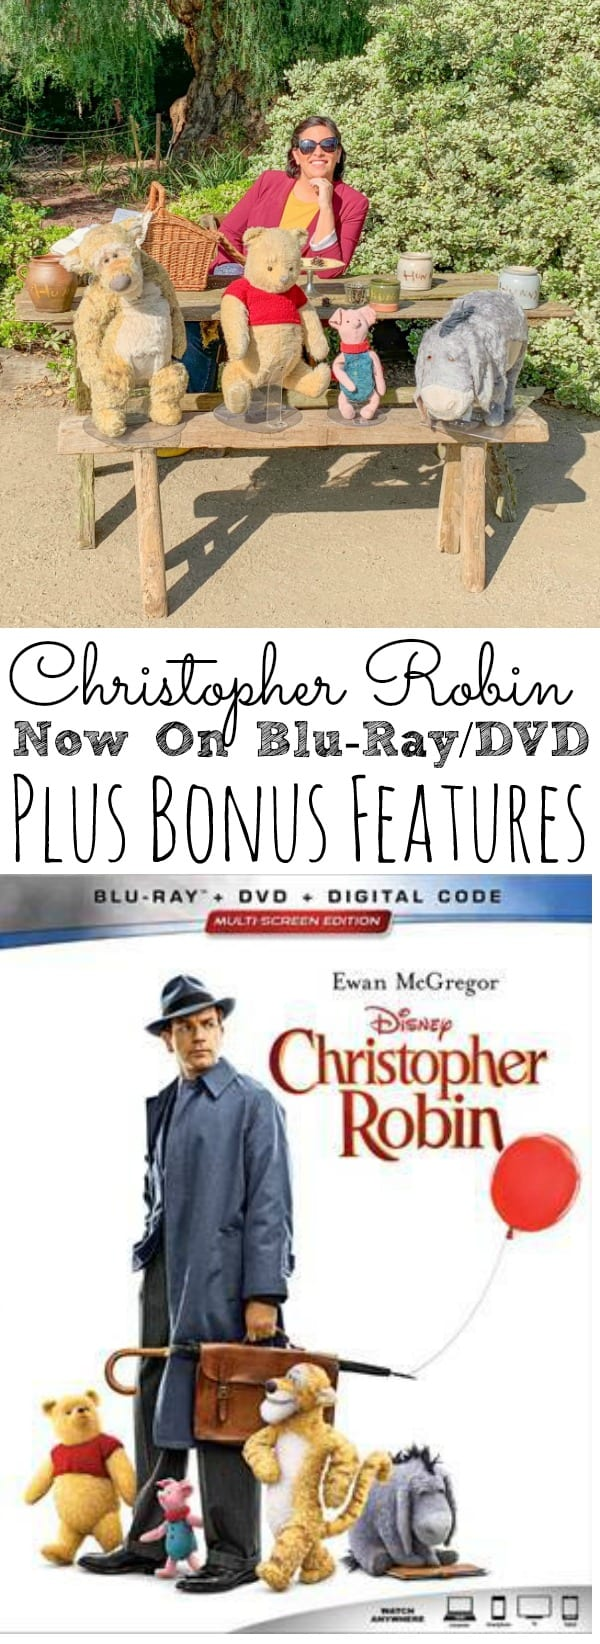 Christopher Robin On Blu-ray and Bonus Features - simplytodaylife.com